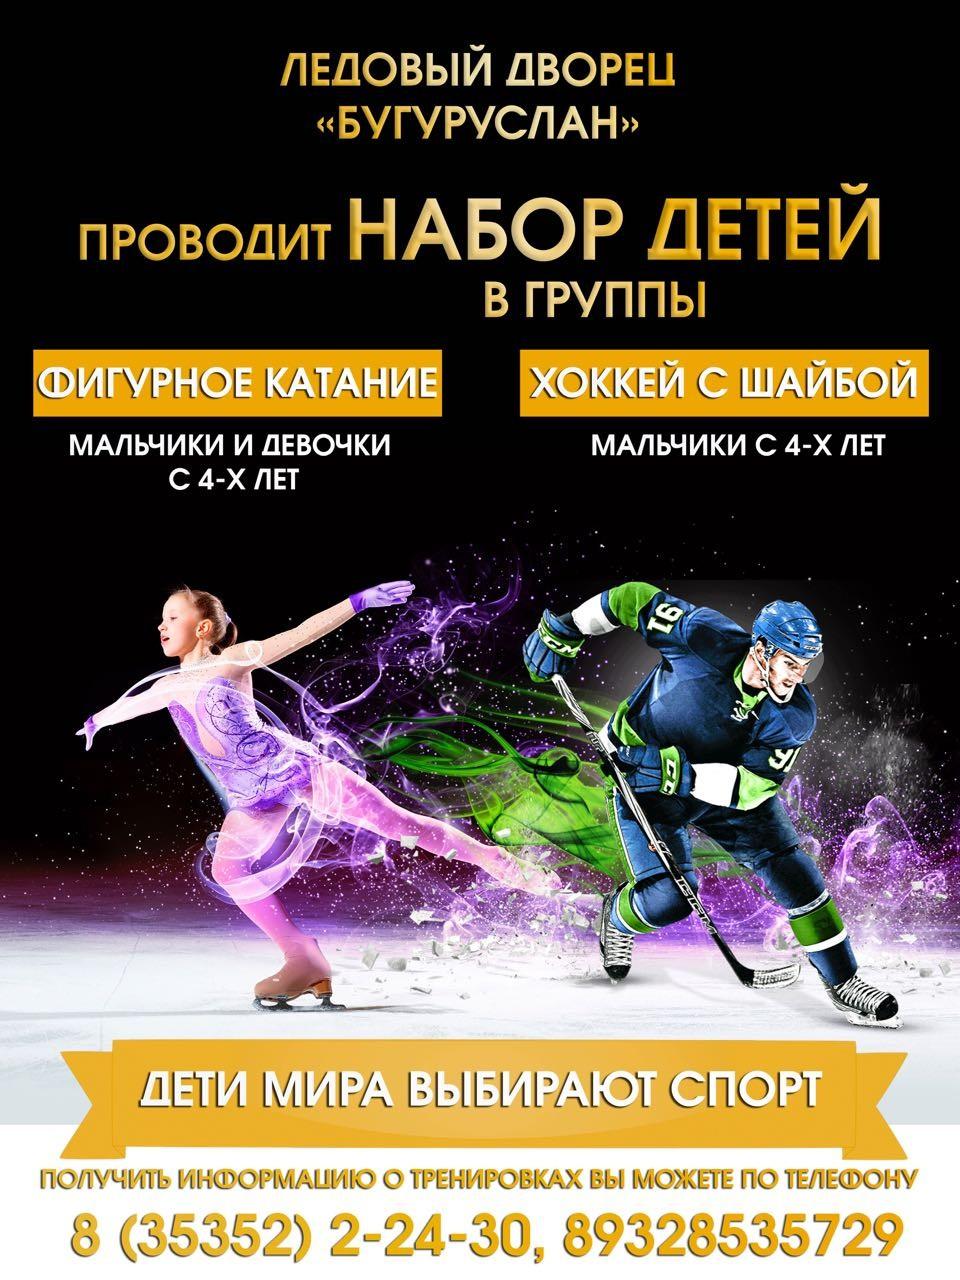 http://ice56.ucoz.ru/_nw/1/14905144.jpg